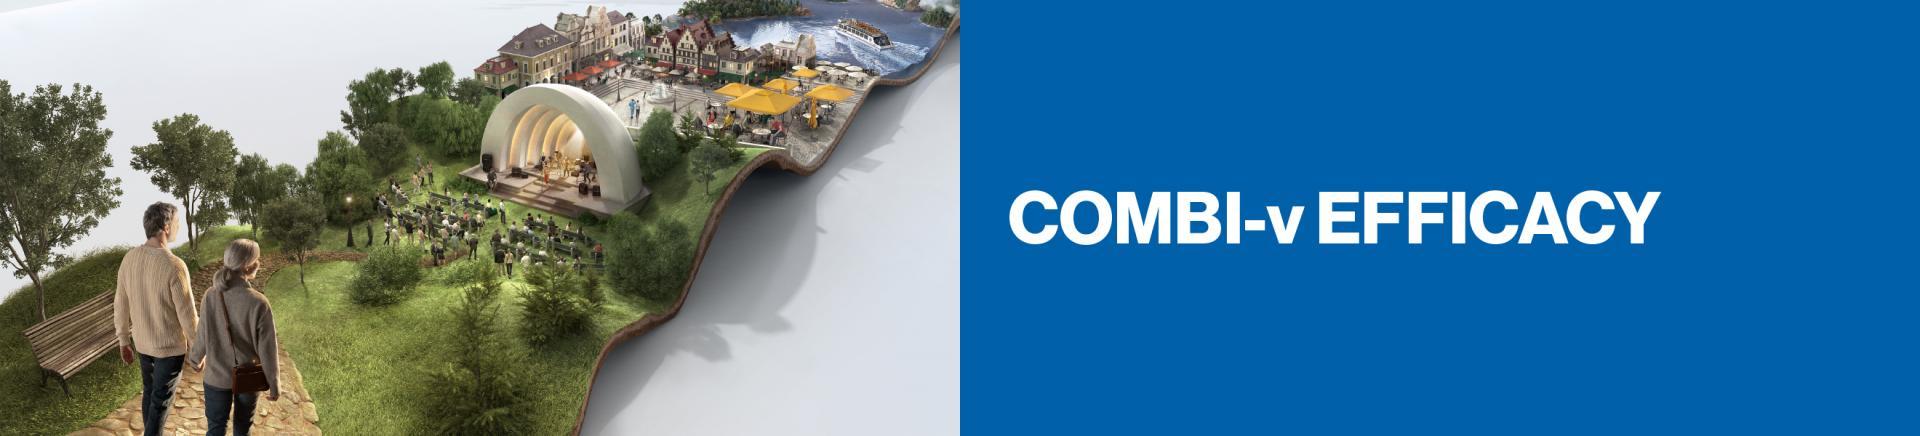 Top banner. COMBI-v Efficacy